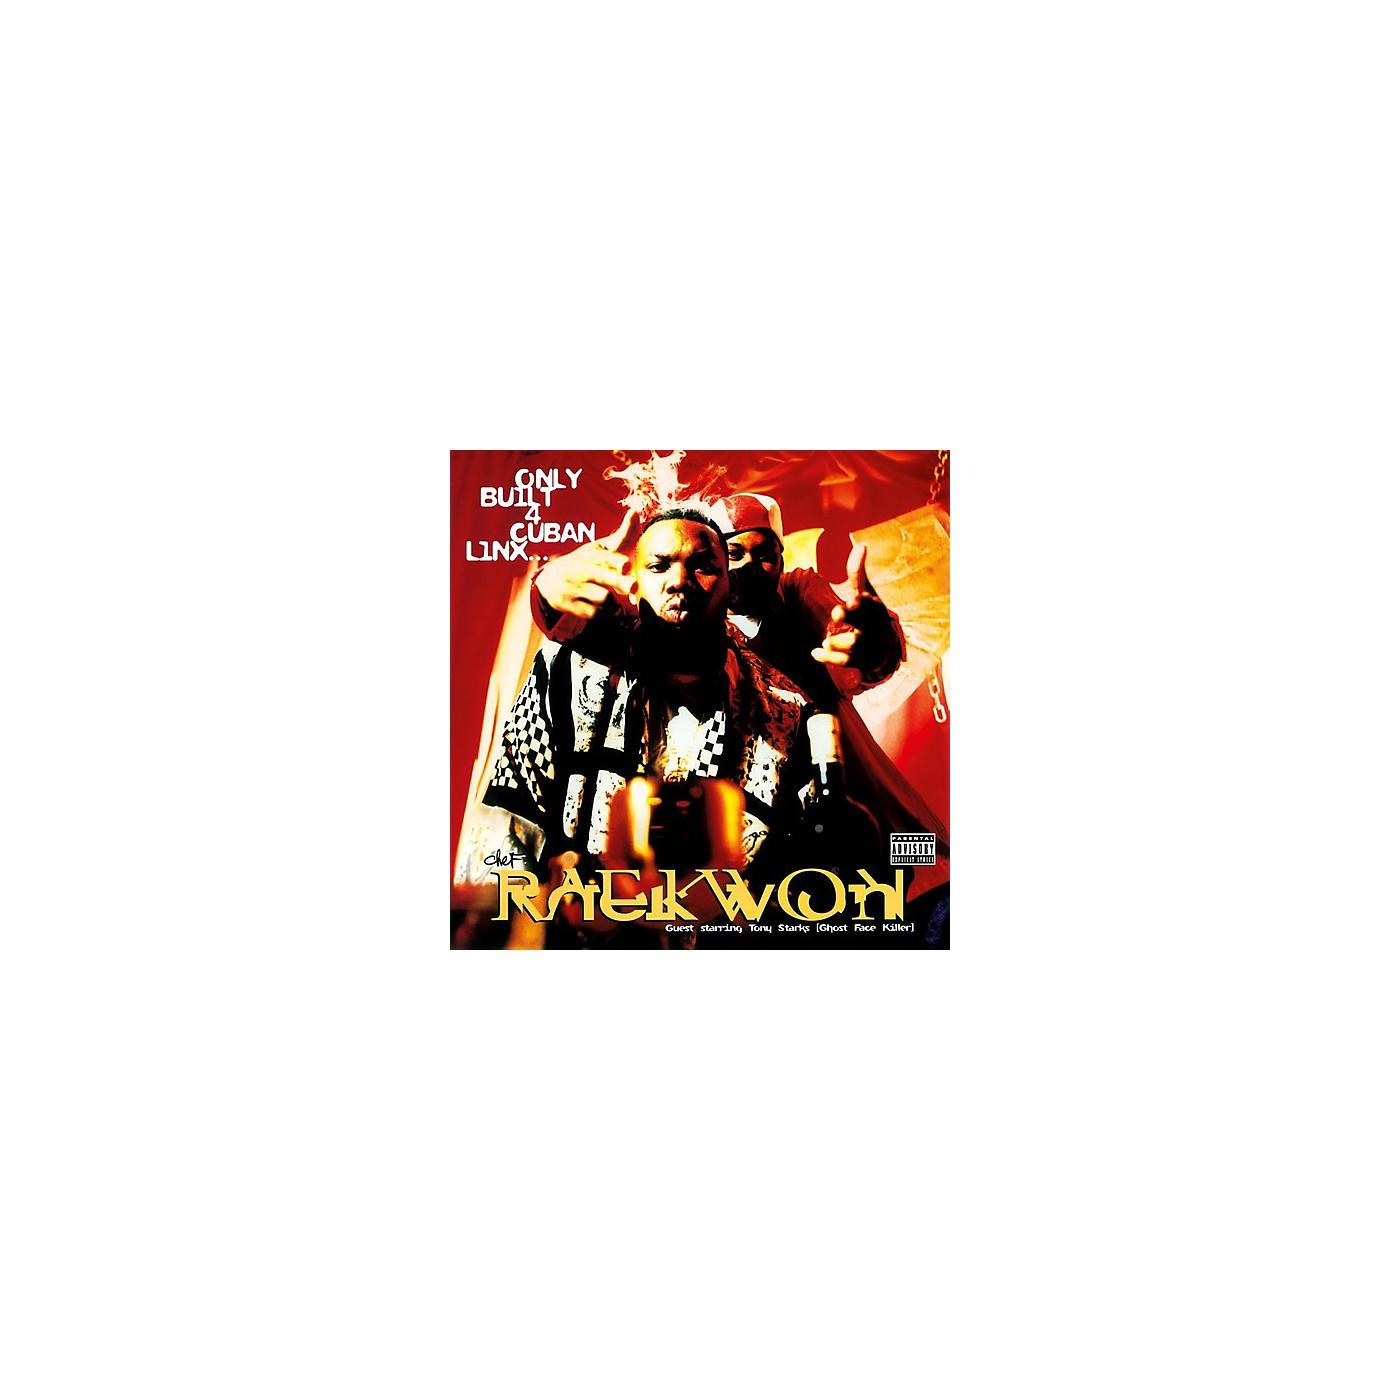 Alliance Raekwon - Only Built 4 Cuban Linx thumbnail